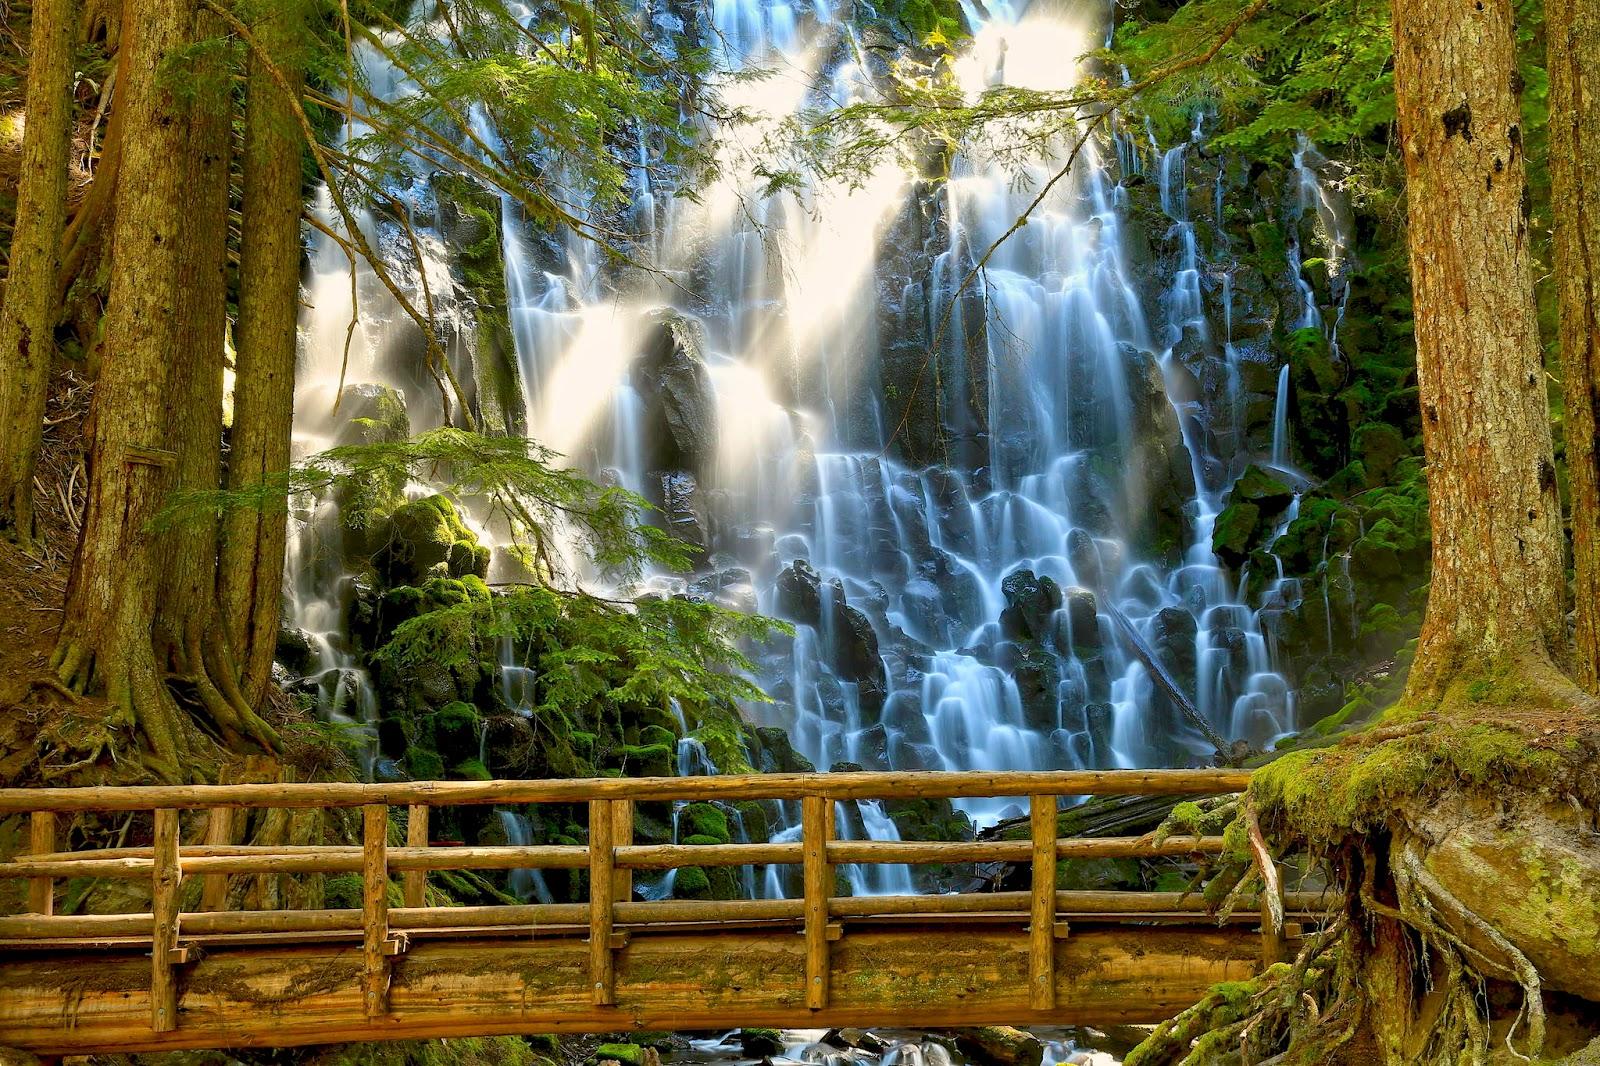 http://3.bp.blogspot.com/-lEeDkbfvVjI/UlyvpUwrpVI/AAAAAAAB7CE/kHp3WxYCeJ4/s1600/2-fotos-de-cascadas-en-paisajes-naturales-waterfalls-and-amazing-natural-landscapes-r%C3%ADos-rivers+(25).jpg